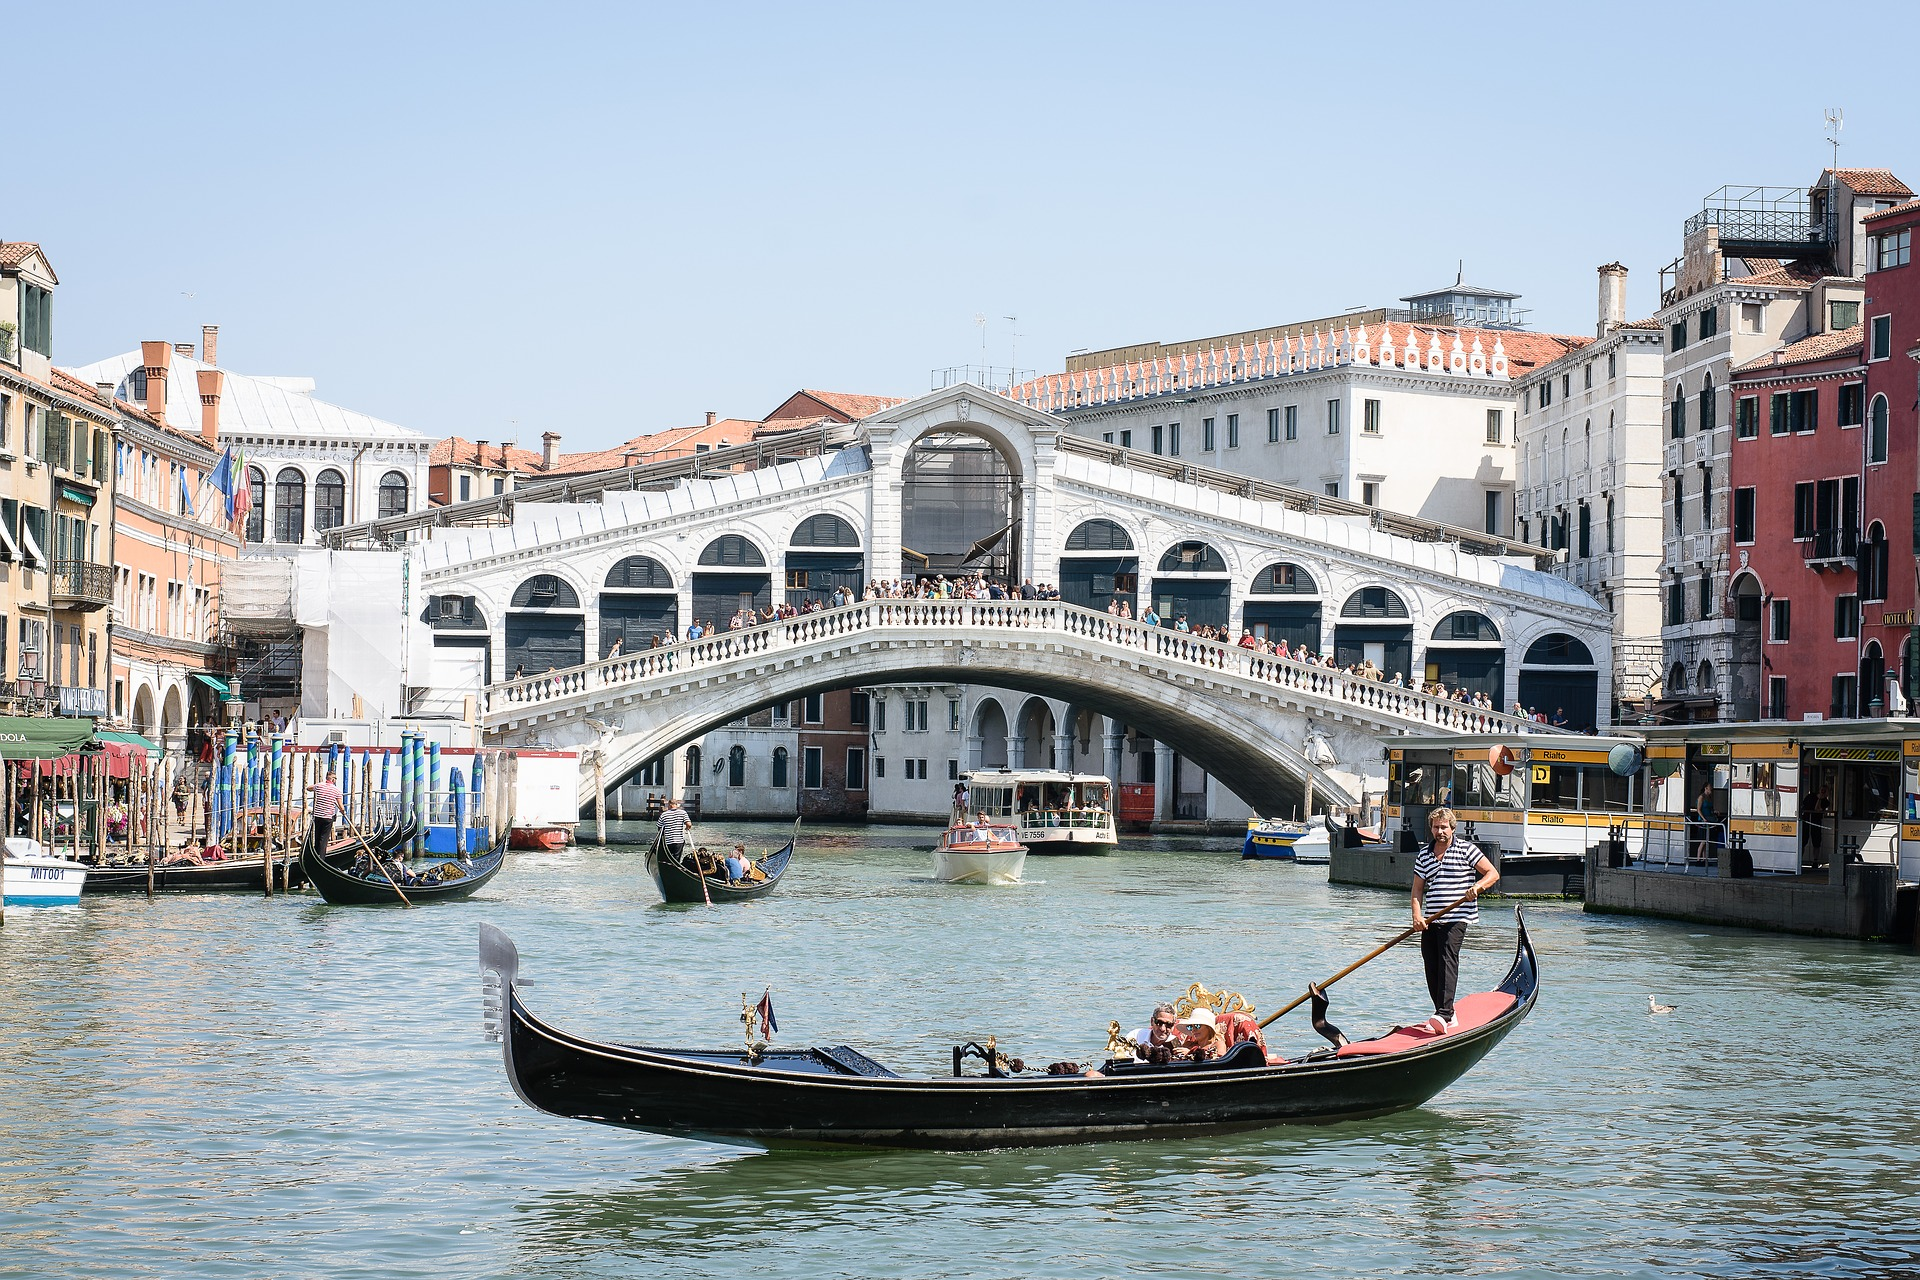 ponte rialto venezia gondola canal grande